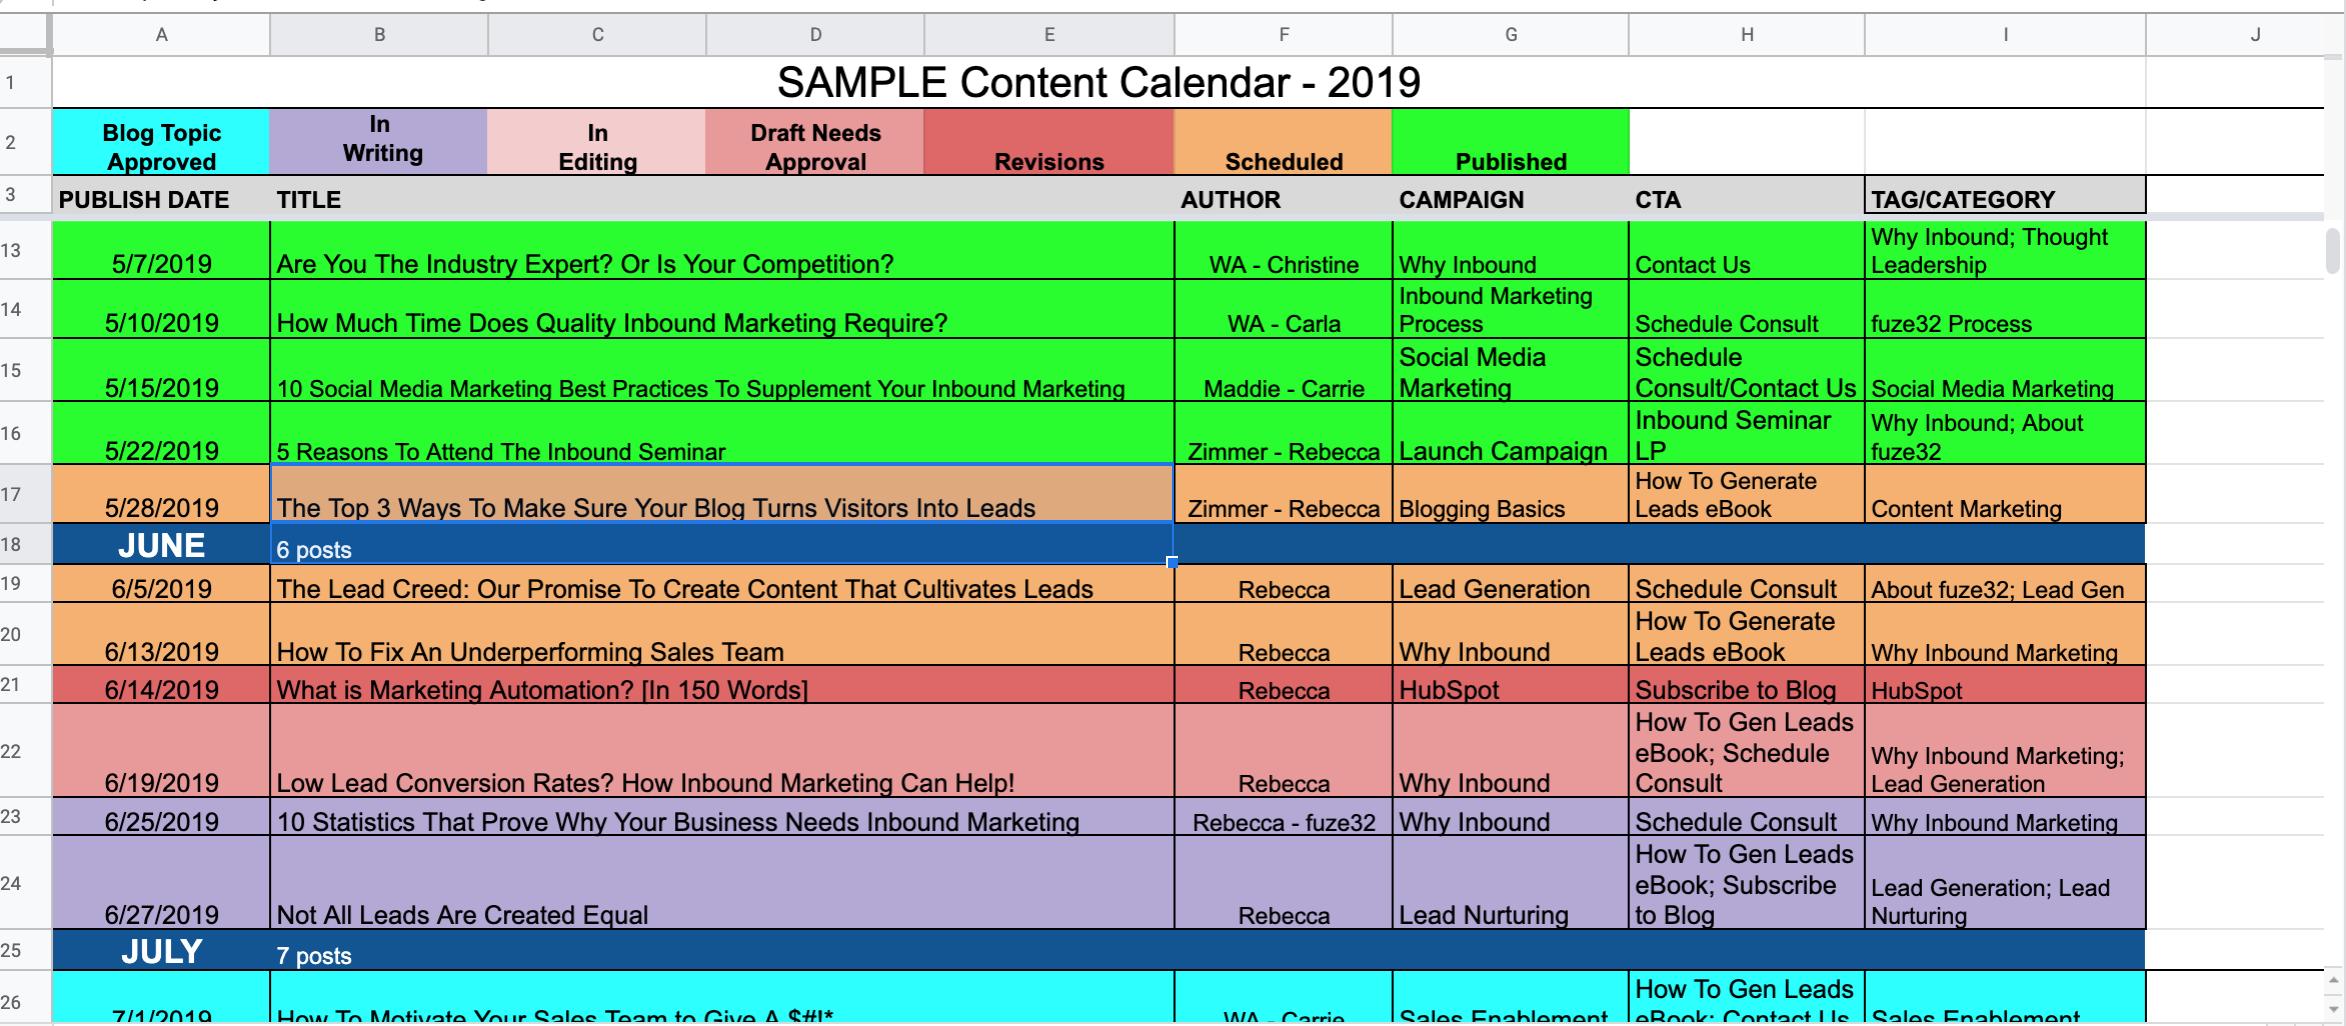 Sample-Content-Calendar-fuze32